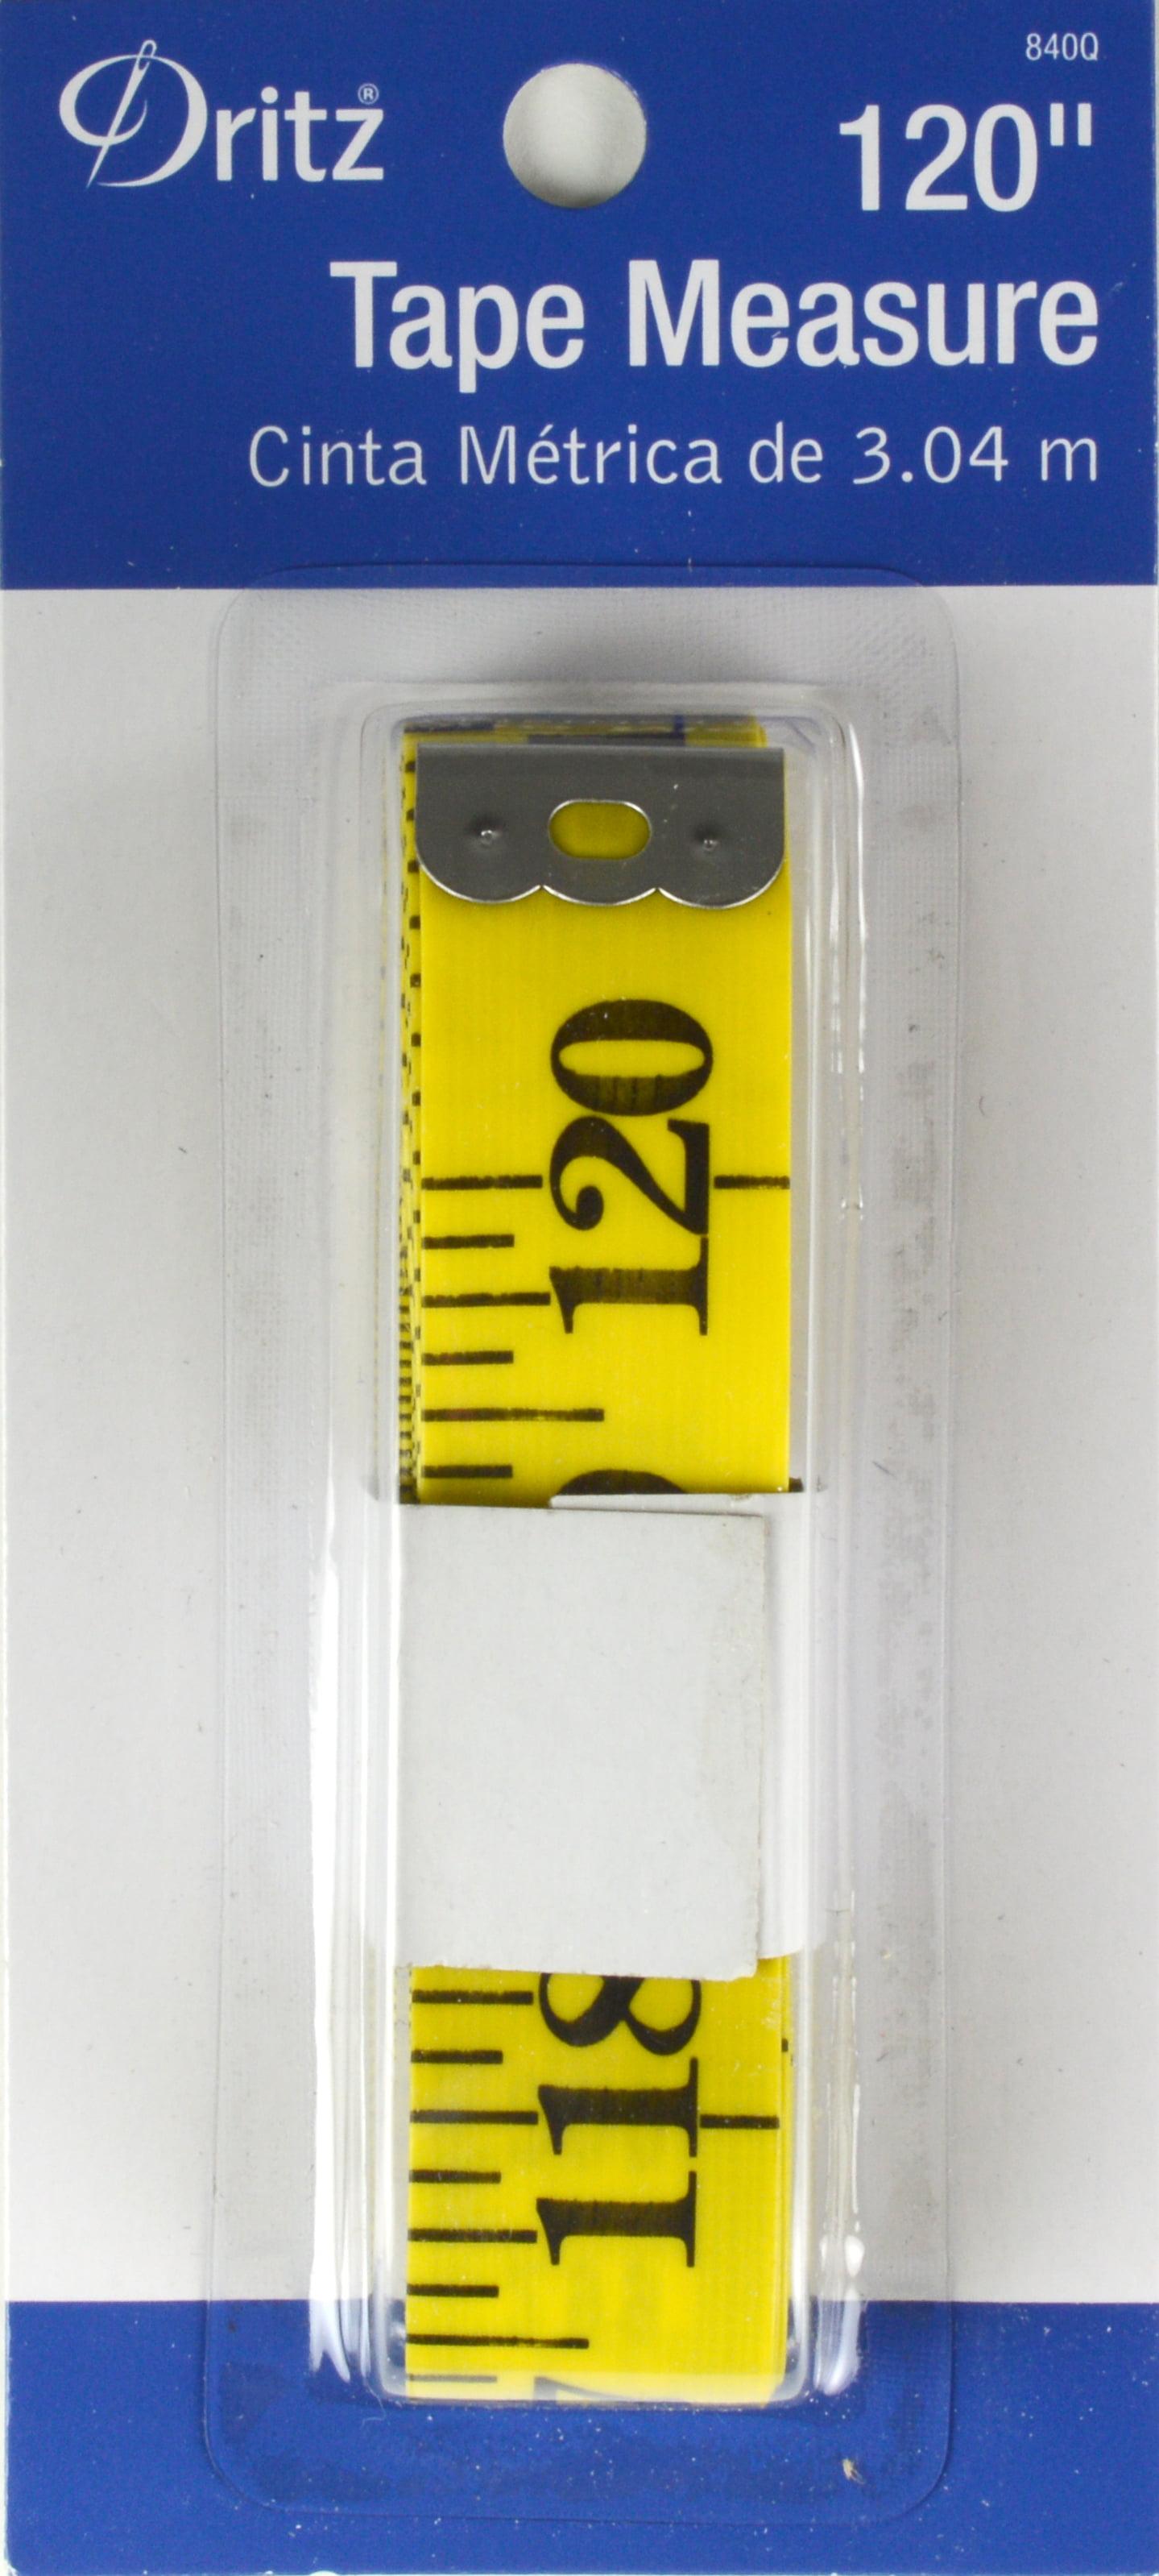 Tape Measure Pedros 3 Meter Metric English Tape 10 feet Pedro/'s 3-meter